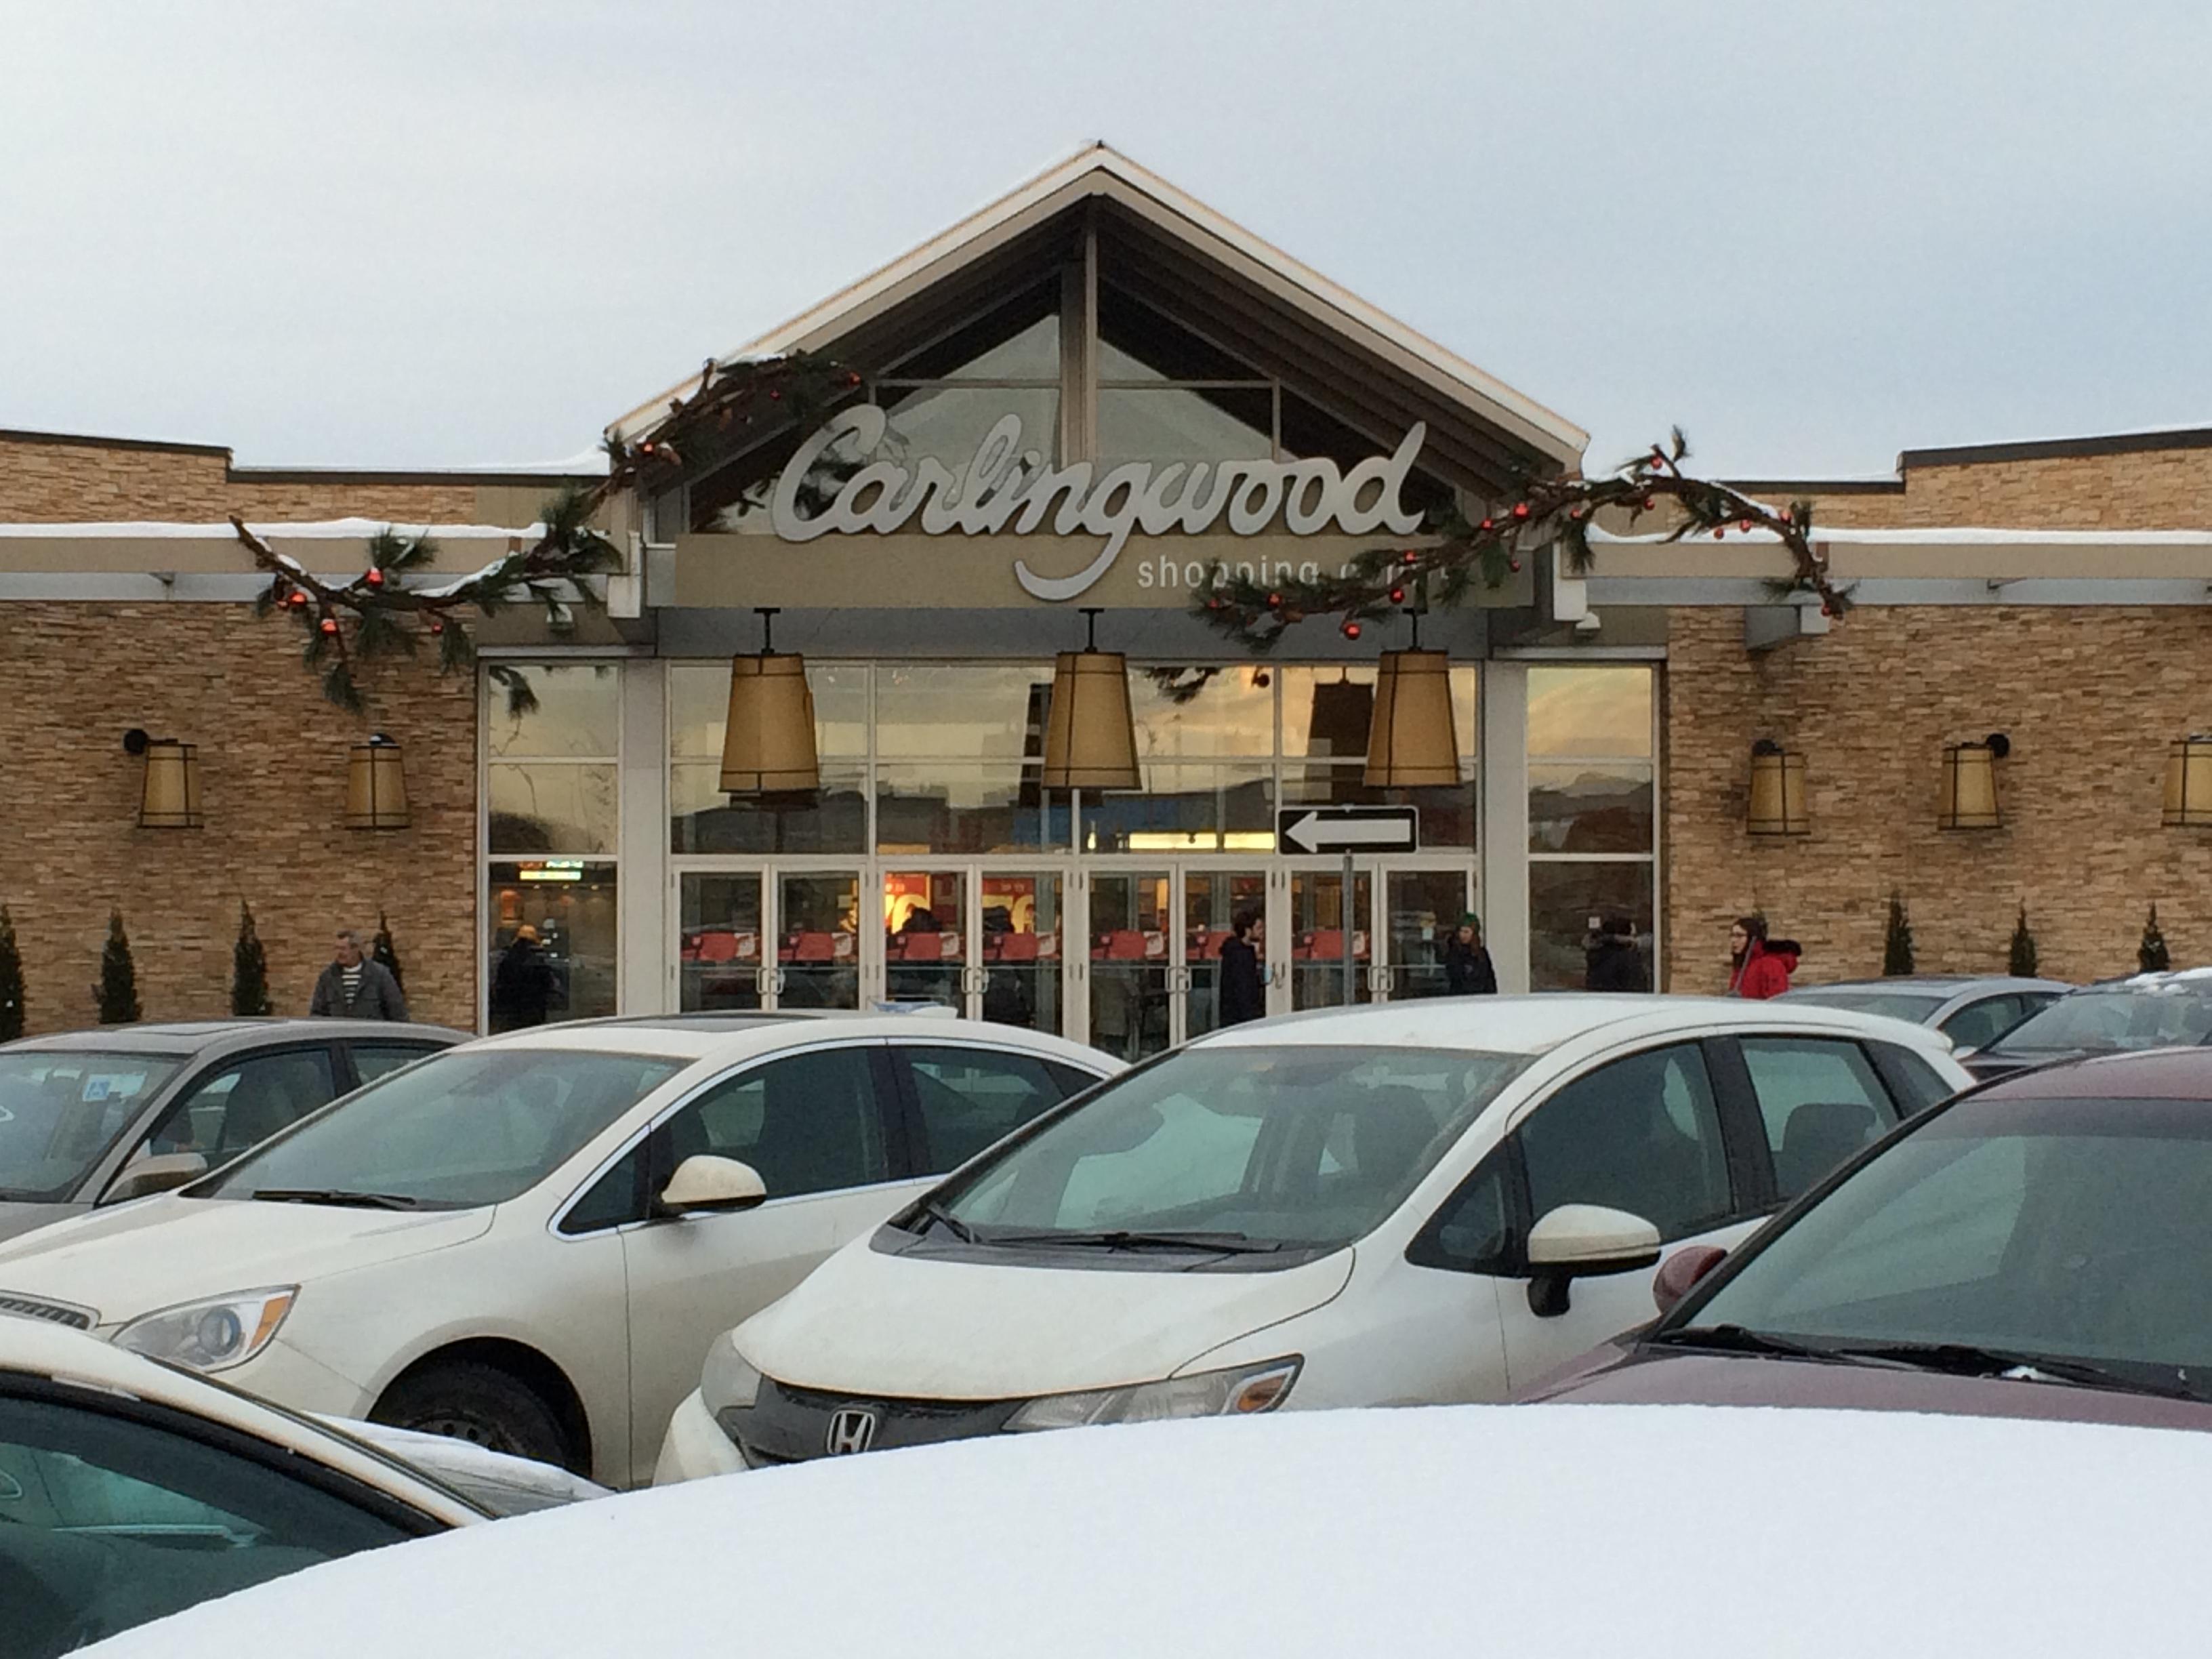 ManShopping Carlingwood Shopping Centre in west Ottawa